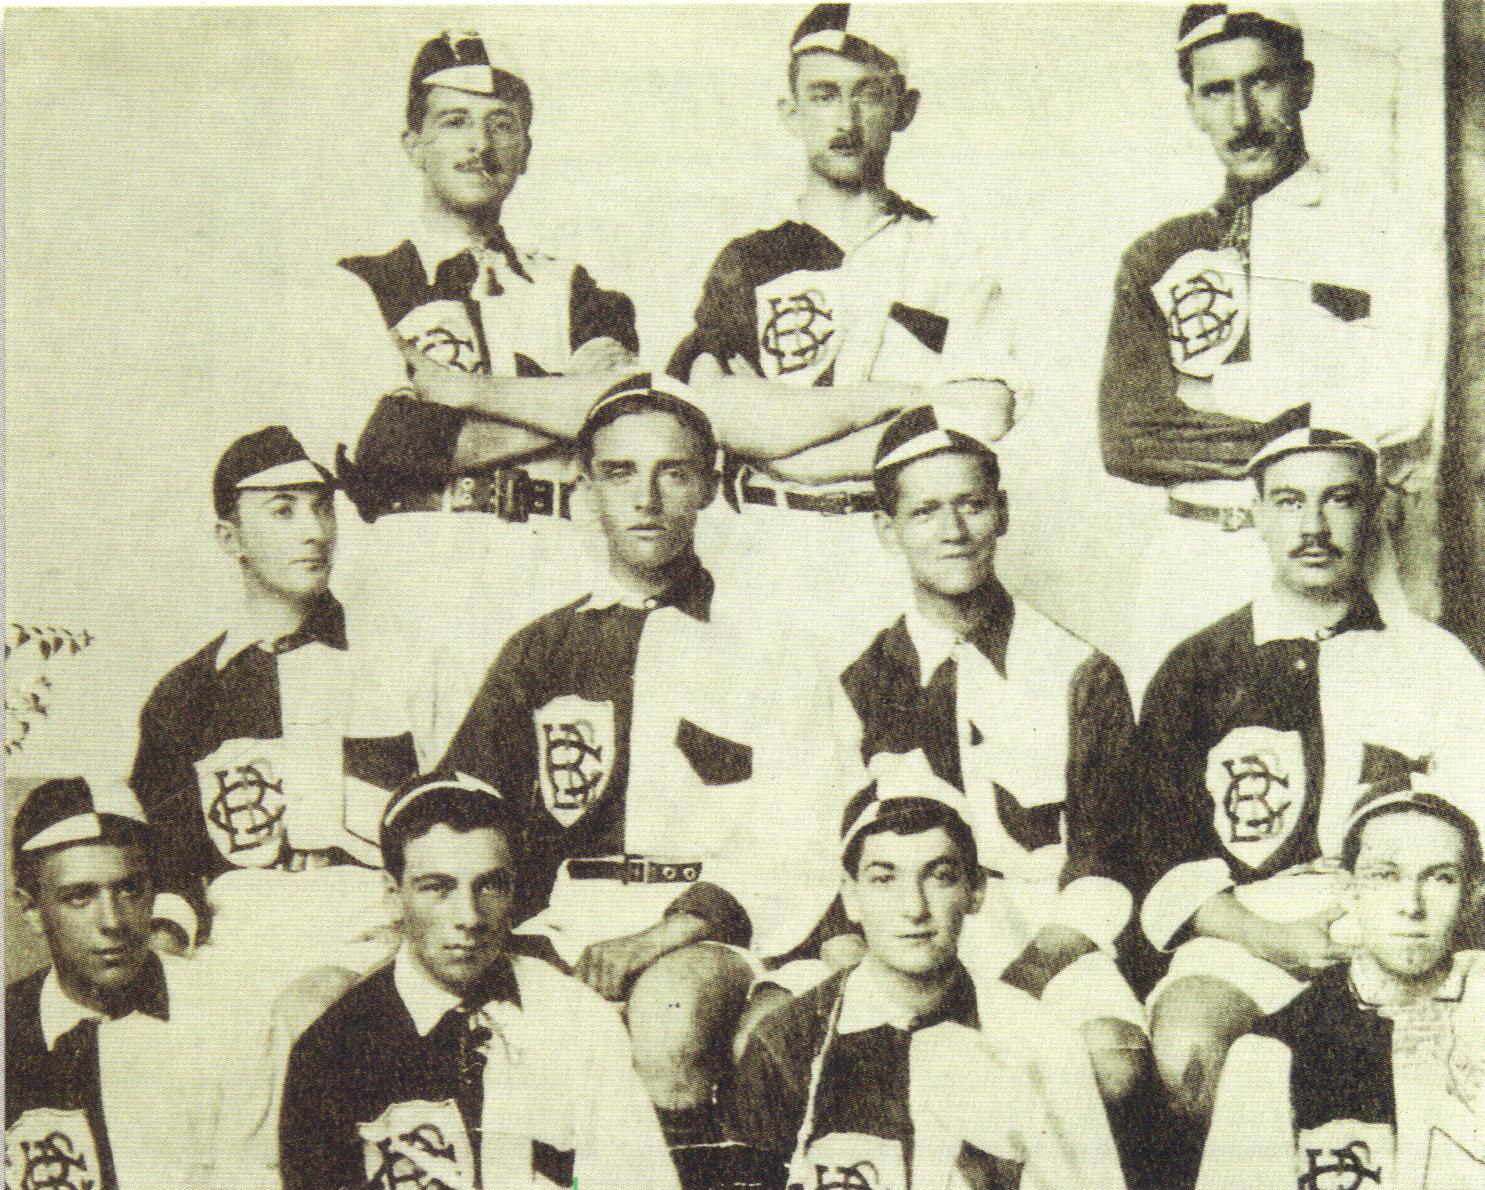 Depiction of Historia del Deportivo Cali